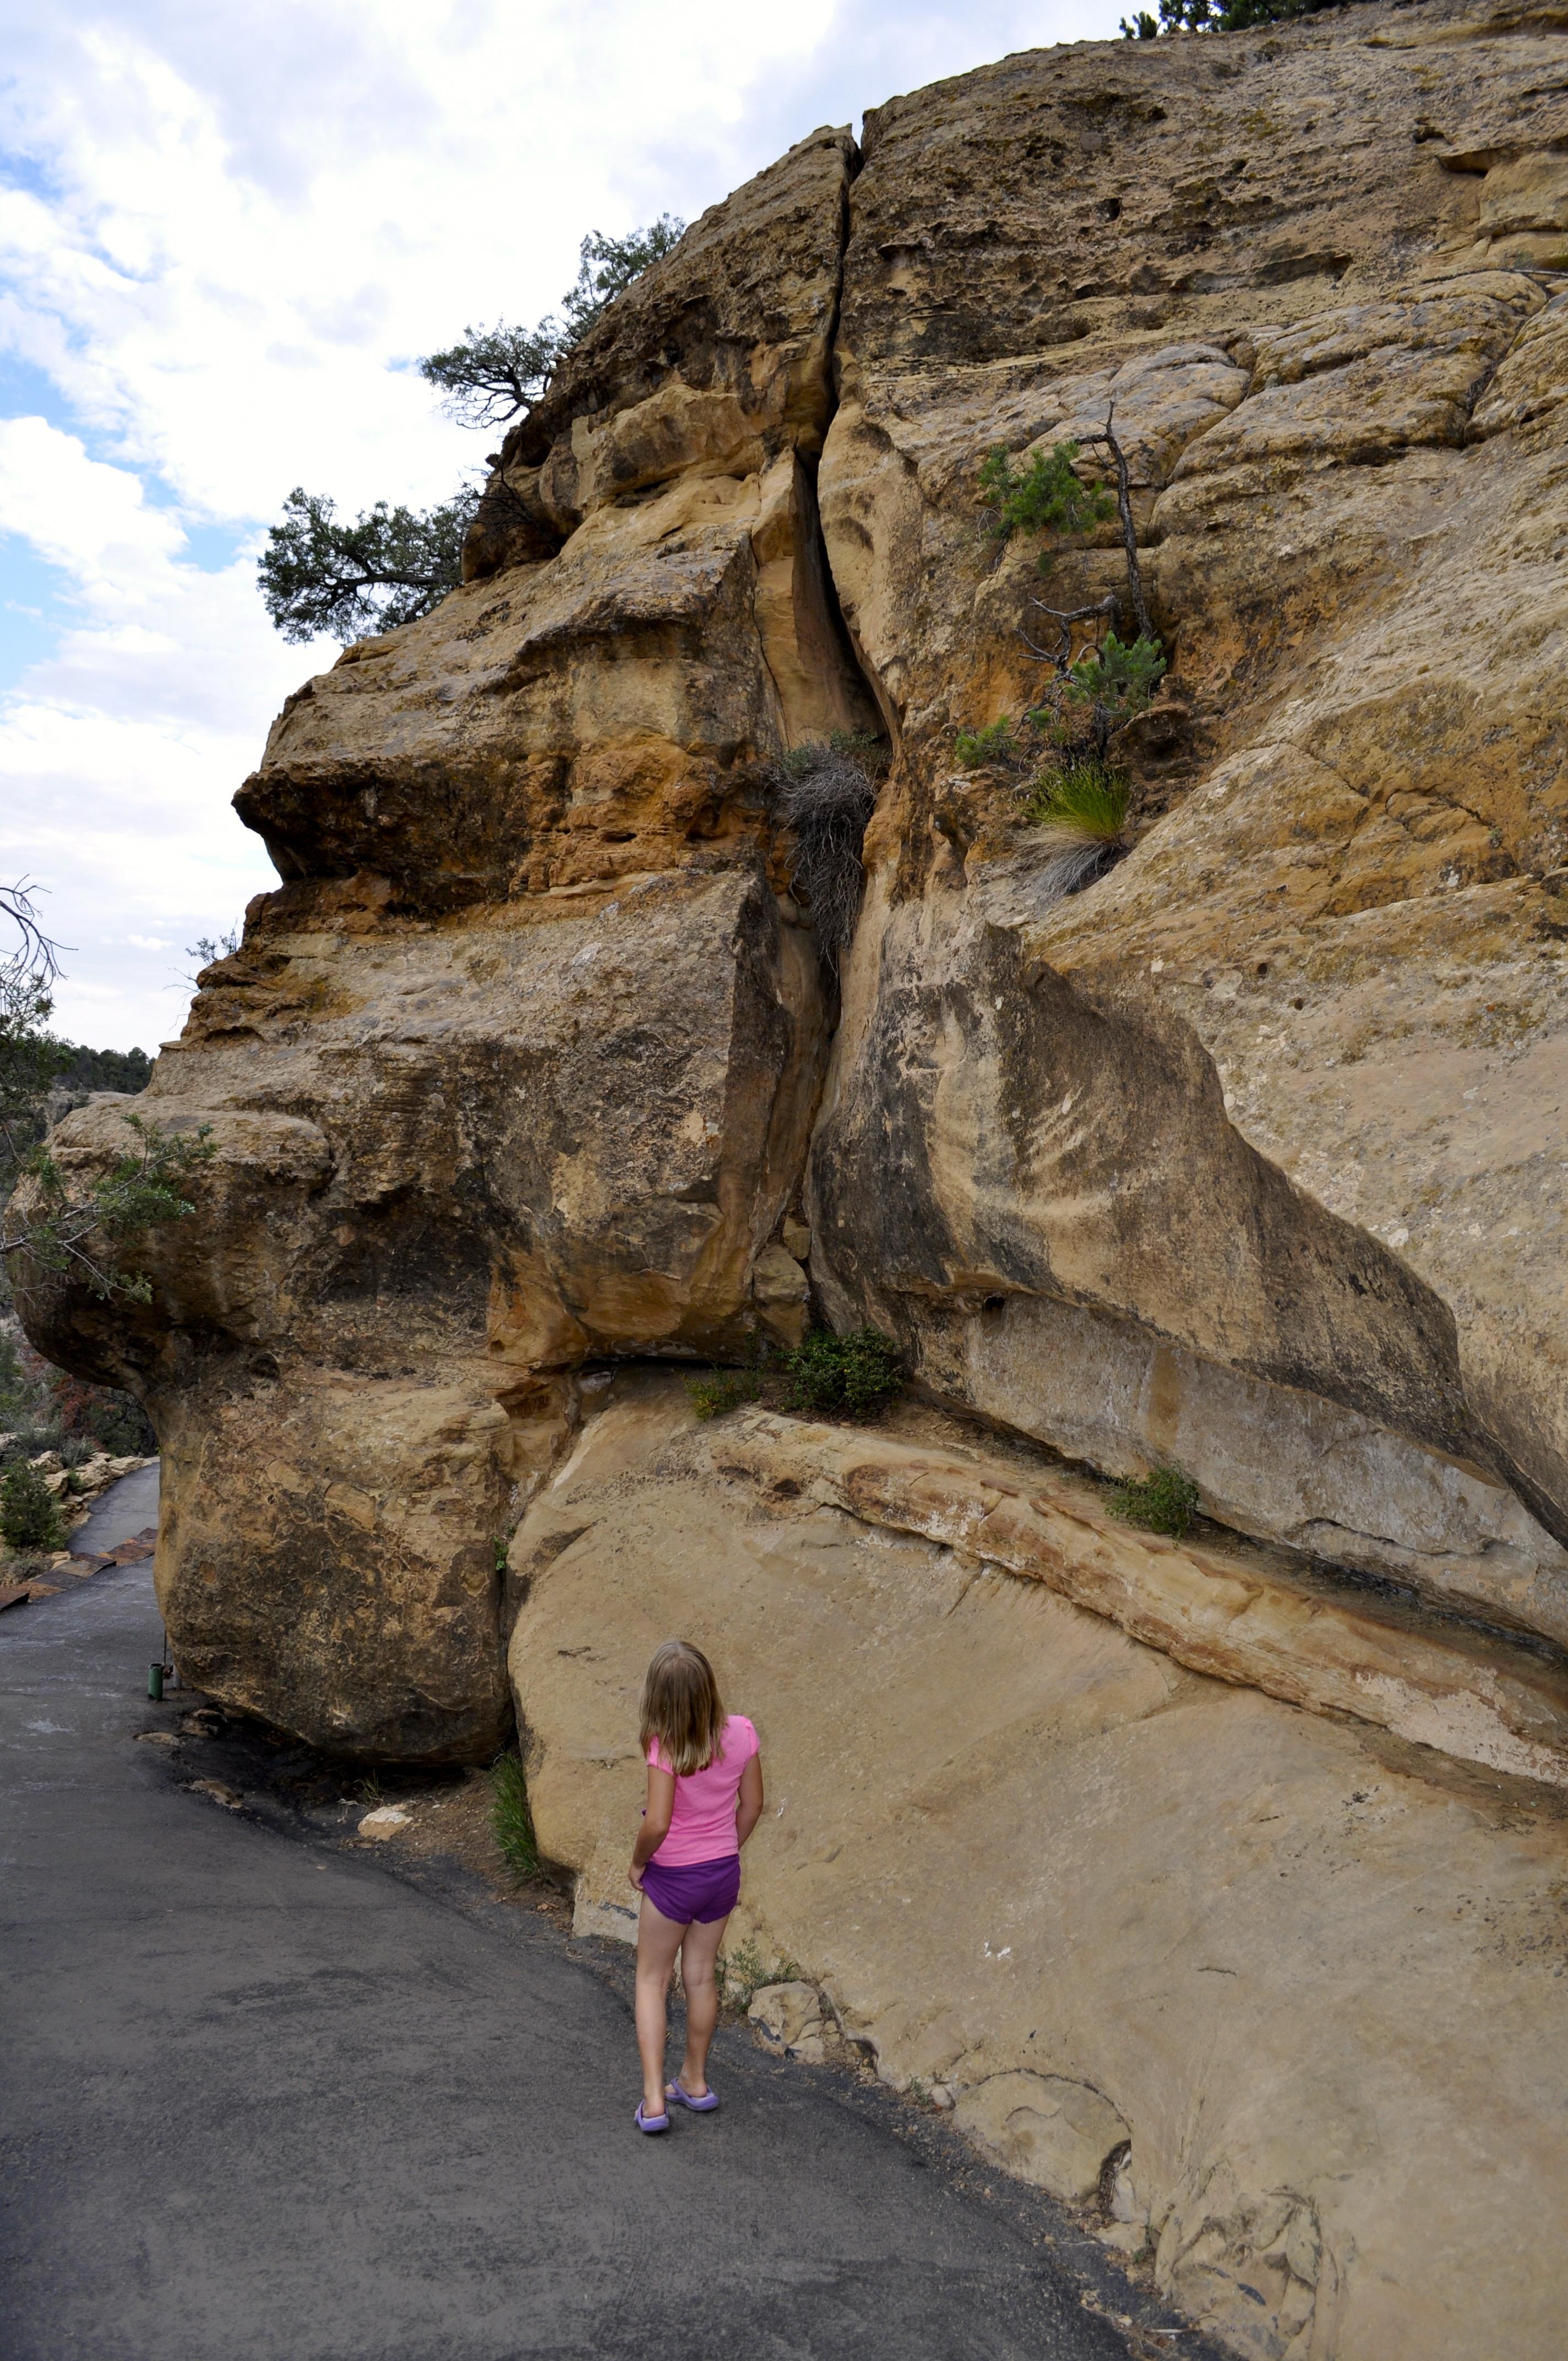 Rocks in nature